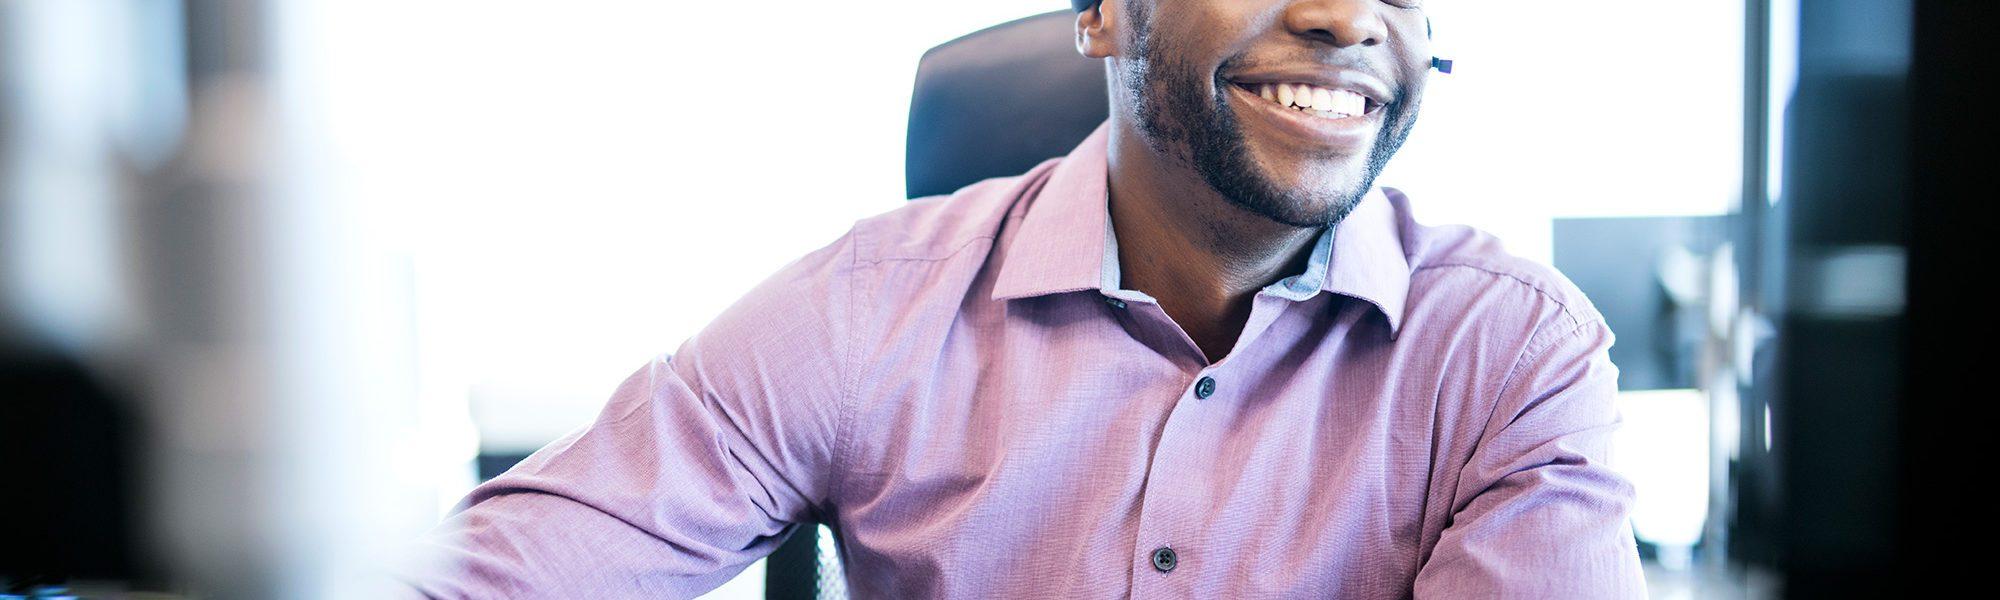 Financial - African American businessman wearing headphones looking at computer smiling